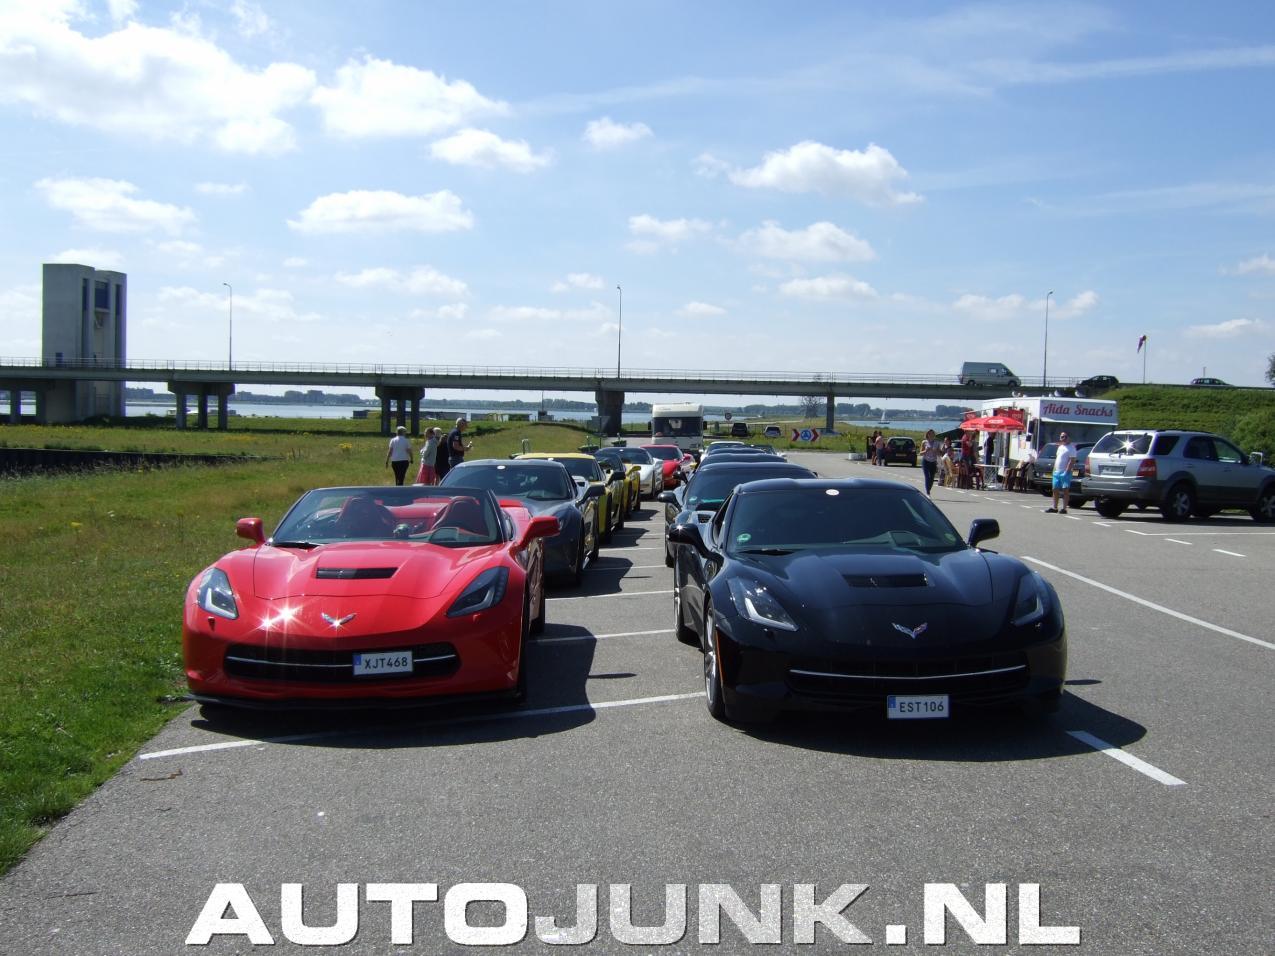 Zweedse Corvette Club In Lelystad Foto S Autojunk Nl